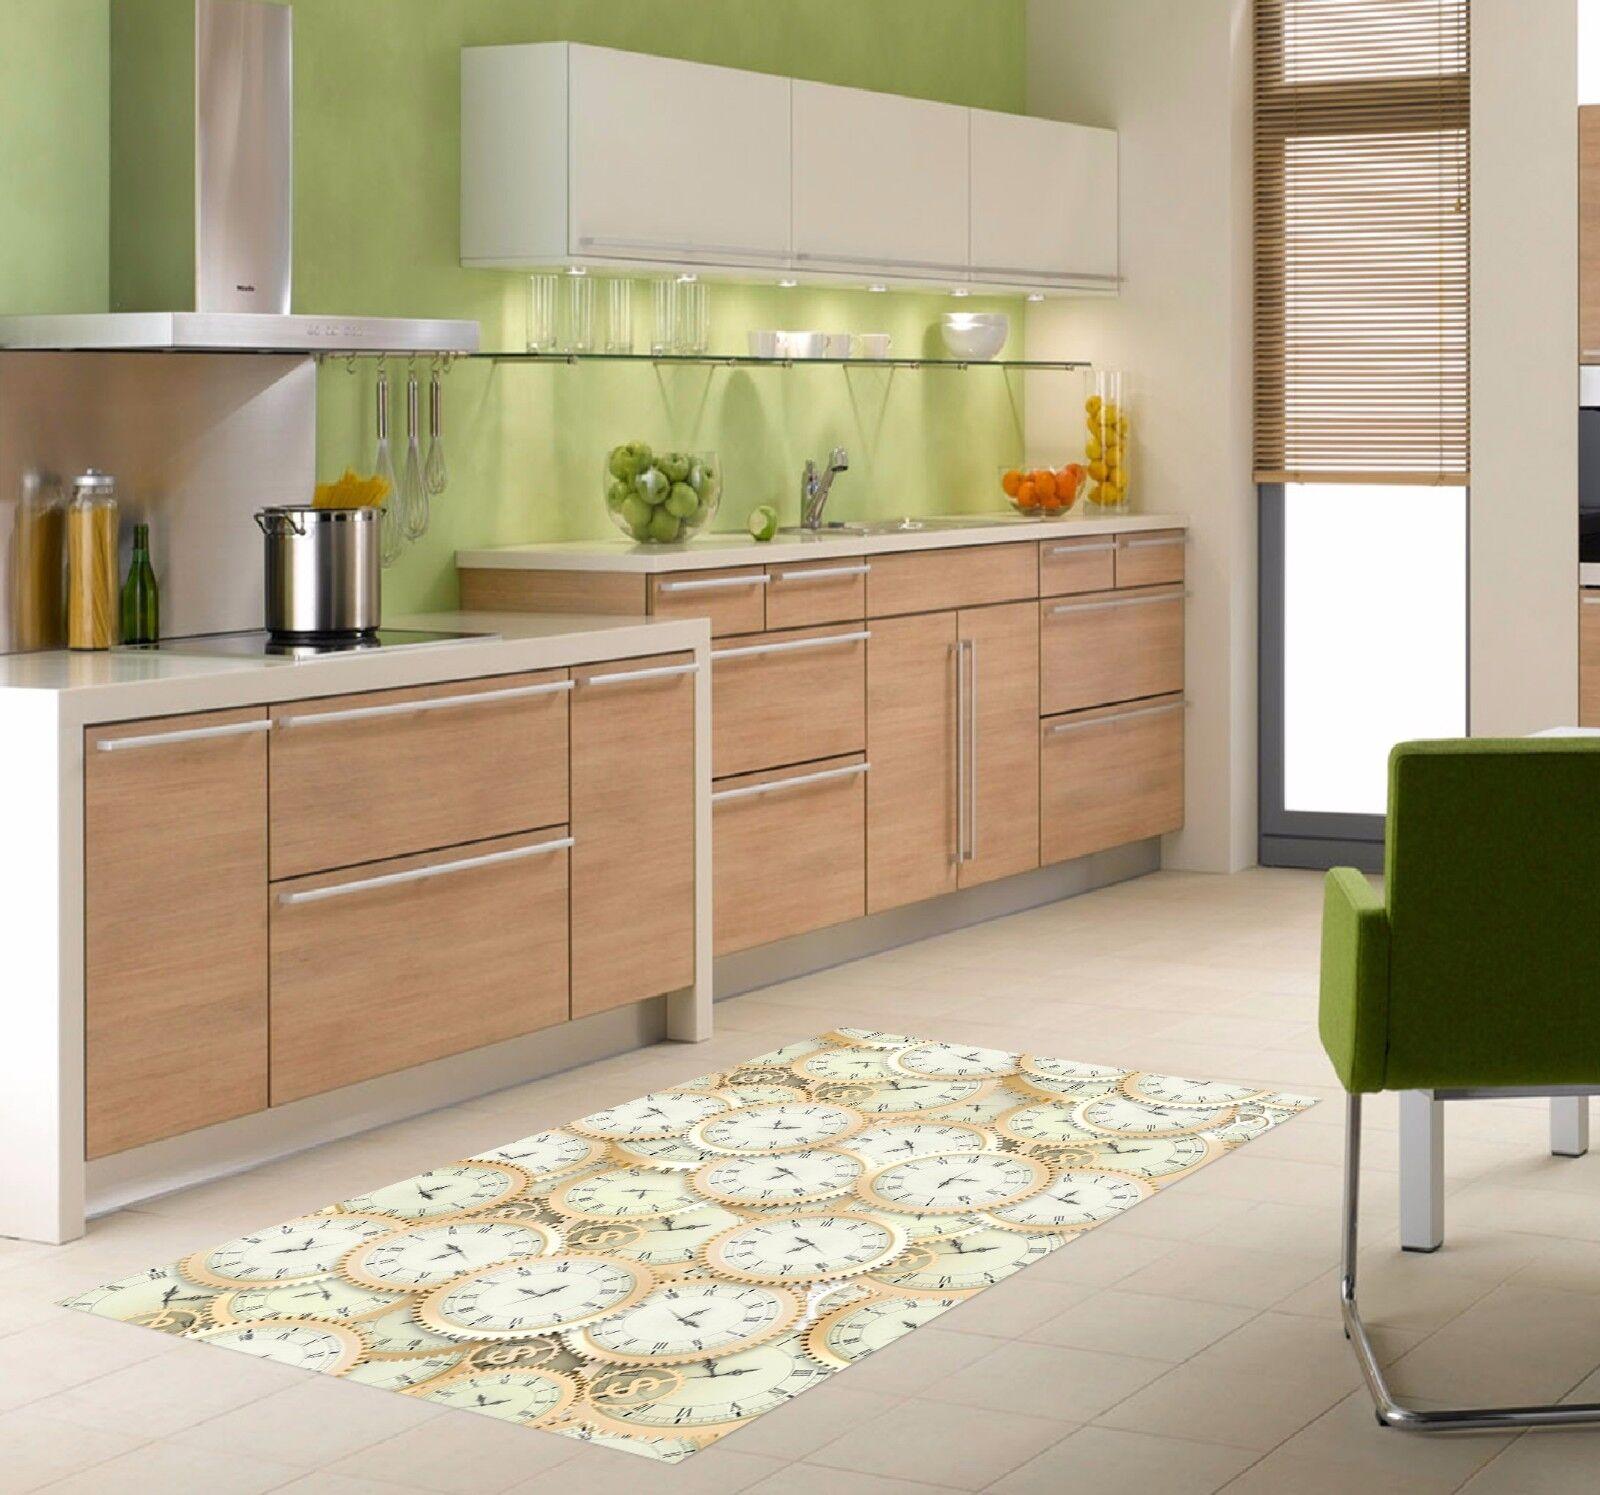 3D White Table 55 Kitchen Mat Floor Murals Wall Print Wall AJ WALLPAPER AU Kyra